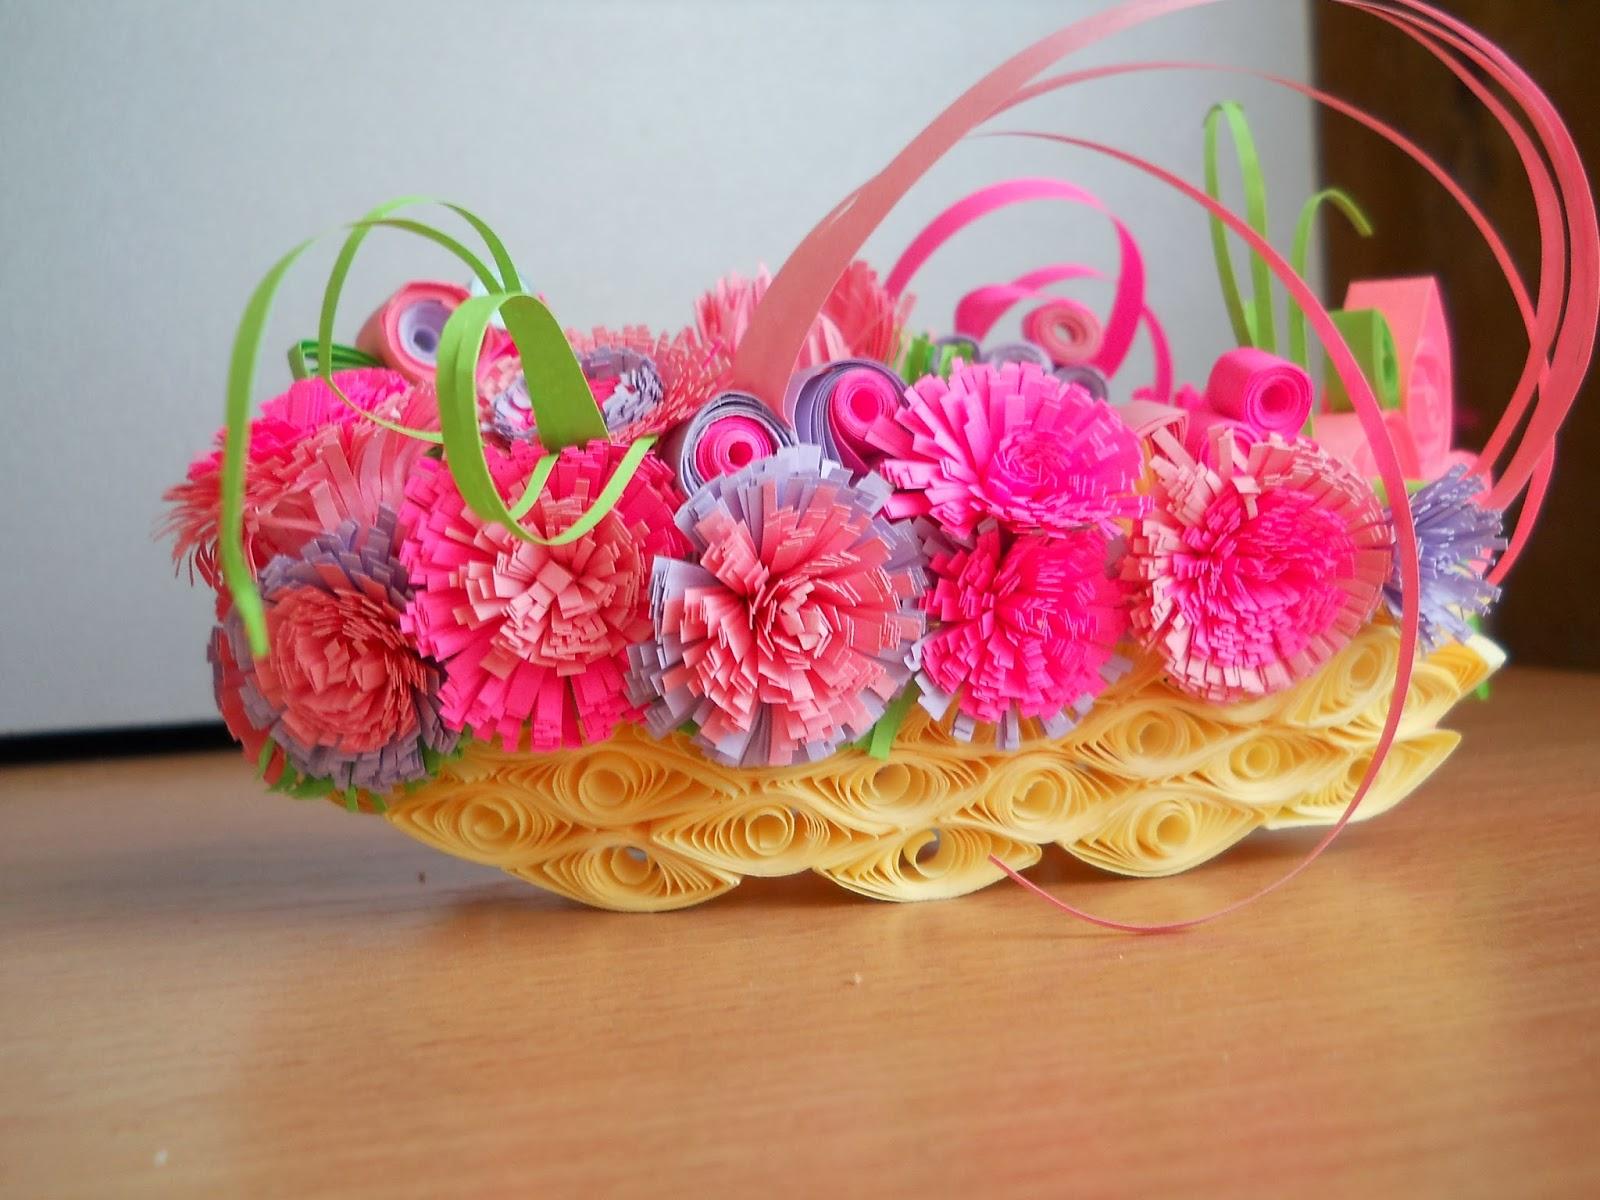 информация про мини цветы: